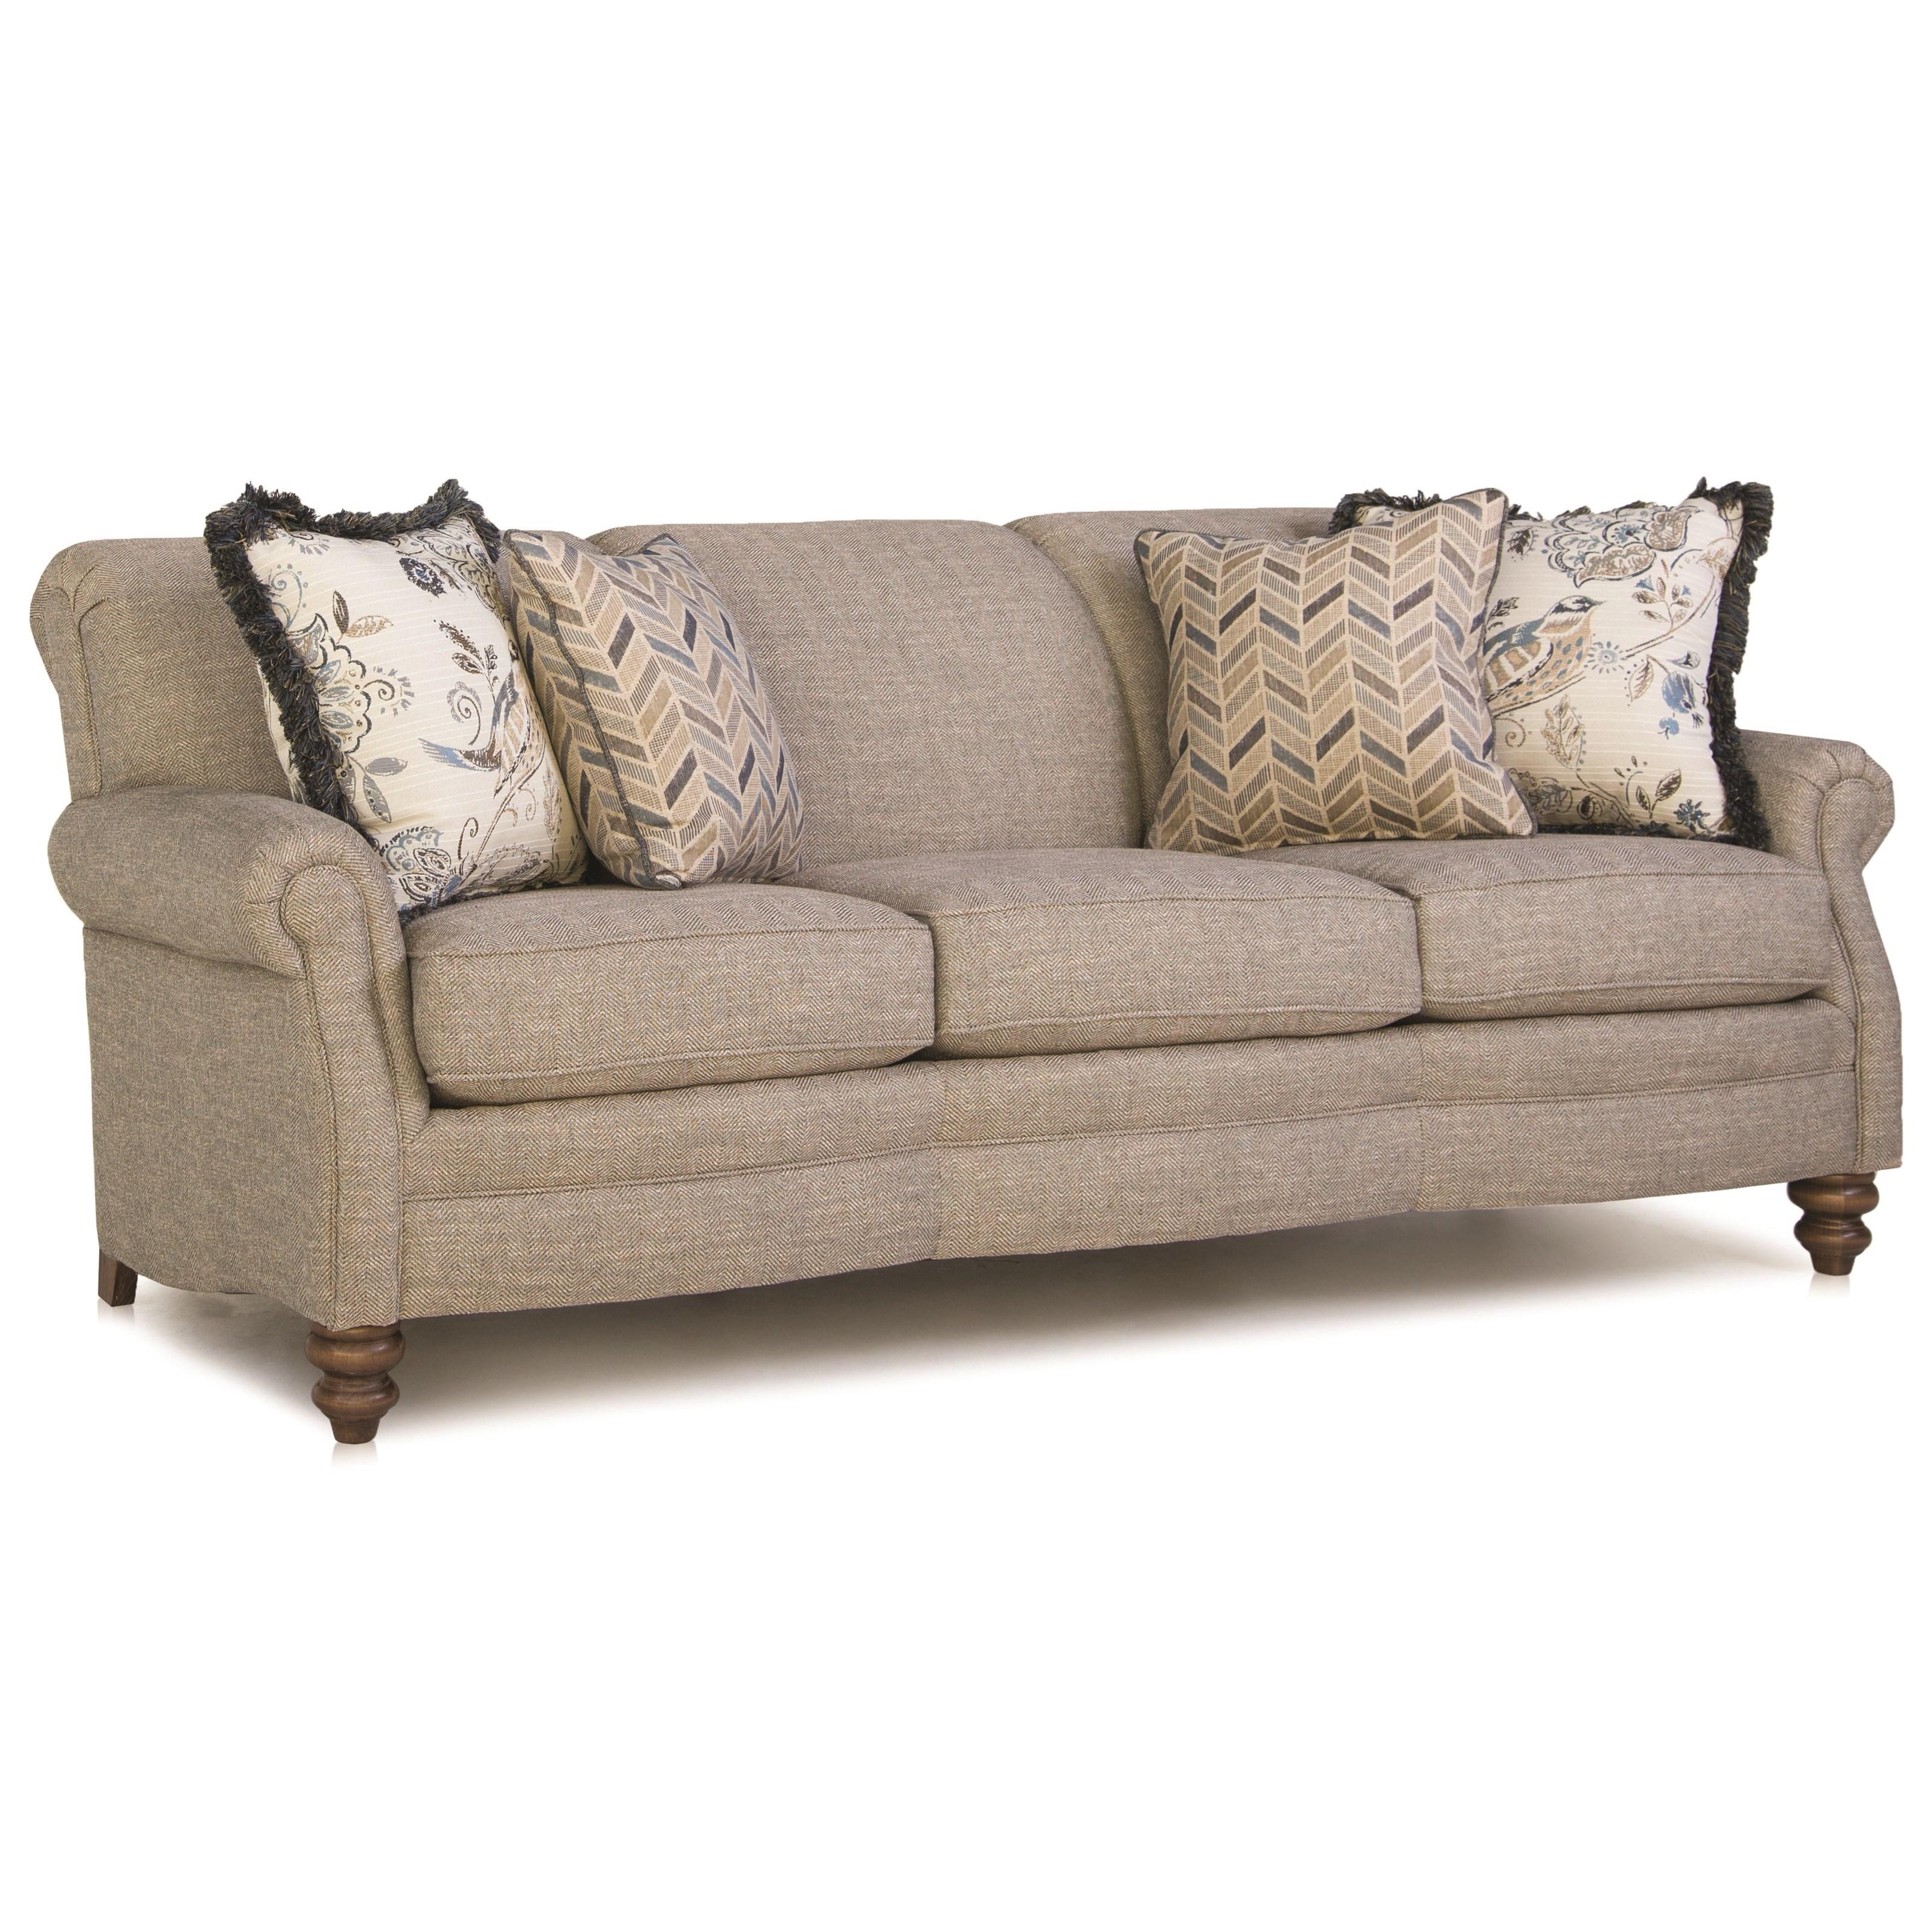 383 Customizable Sofa by Smith Brothers at Johnny Janosik